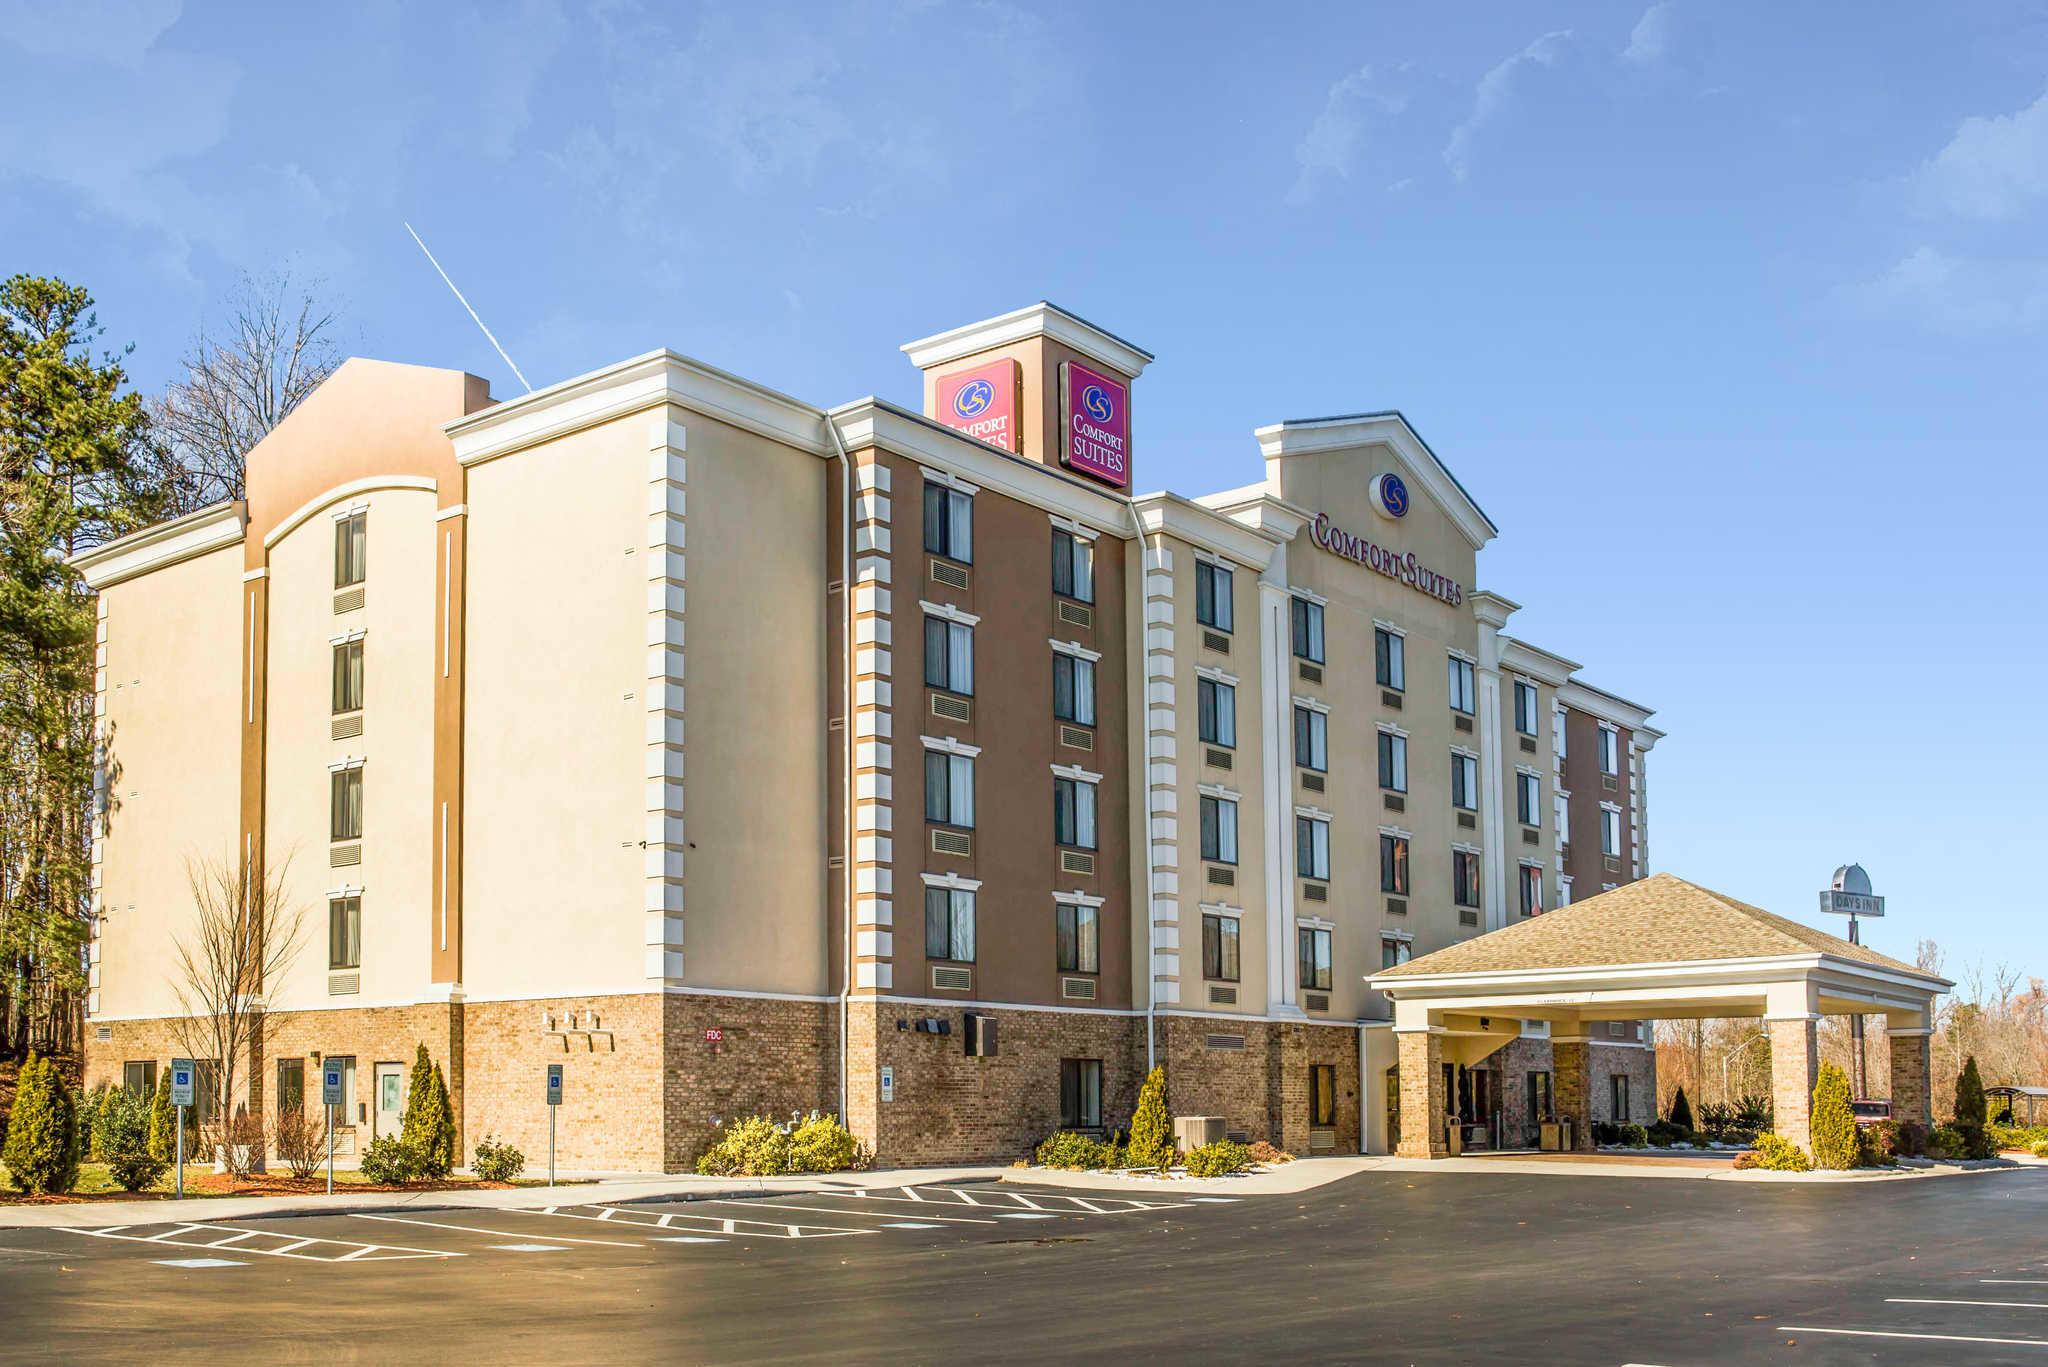 Comfort Suites Four Seasons At 3308 Isler Street